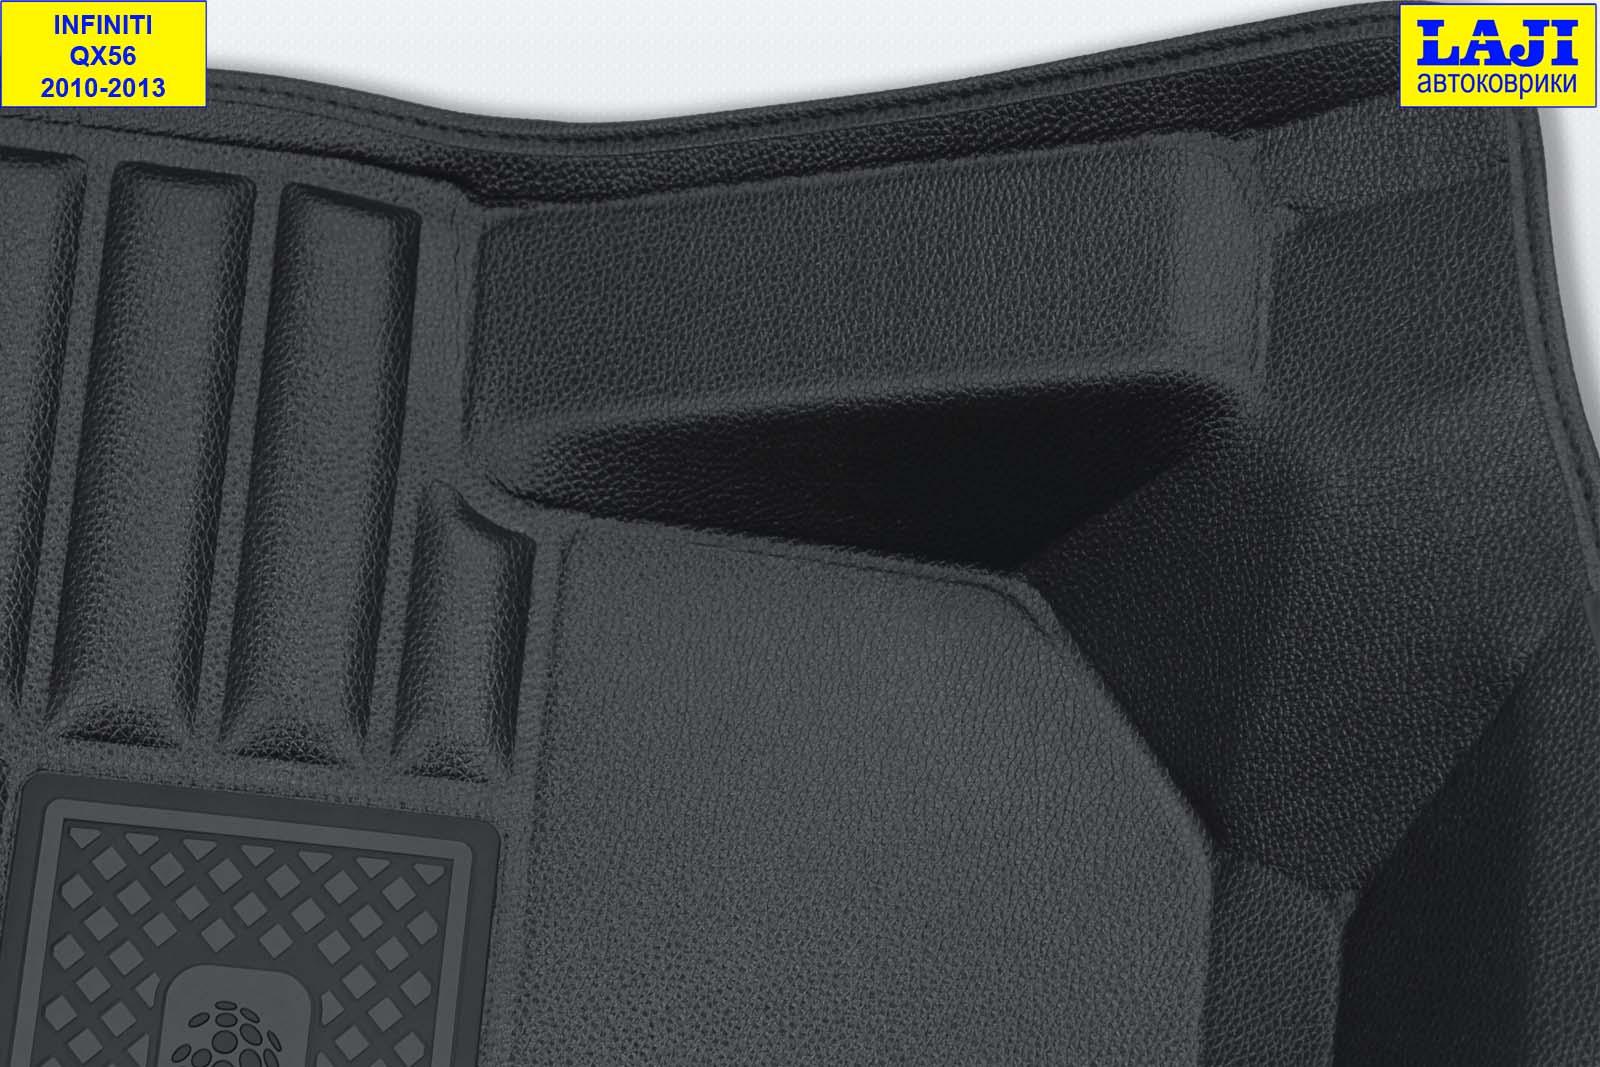 5D коврики в салон Infiniti QX56 2010-2013 6